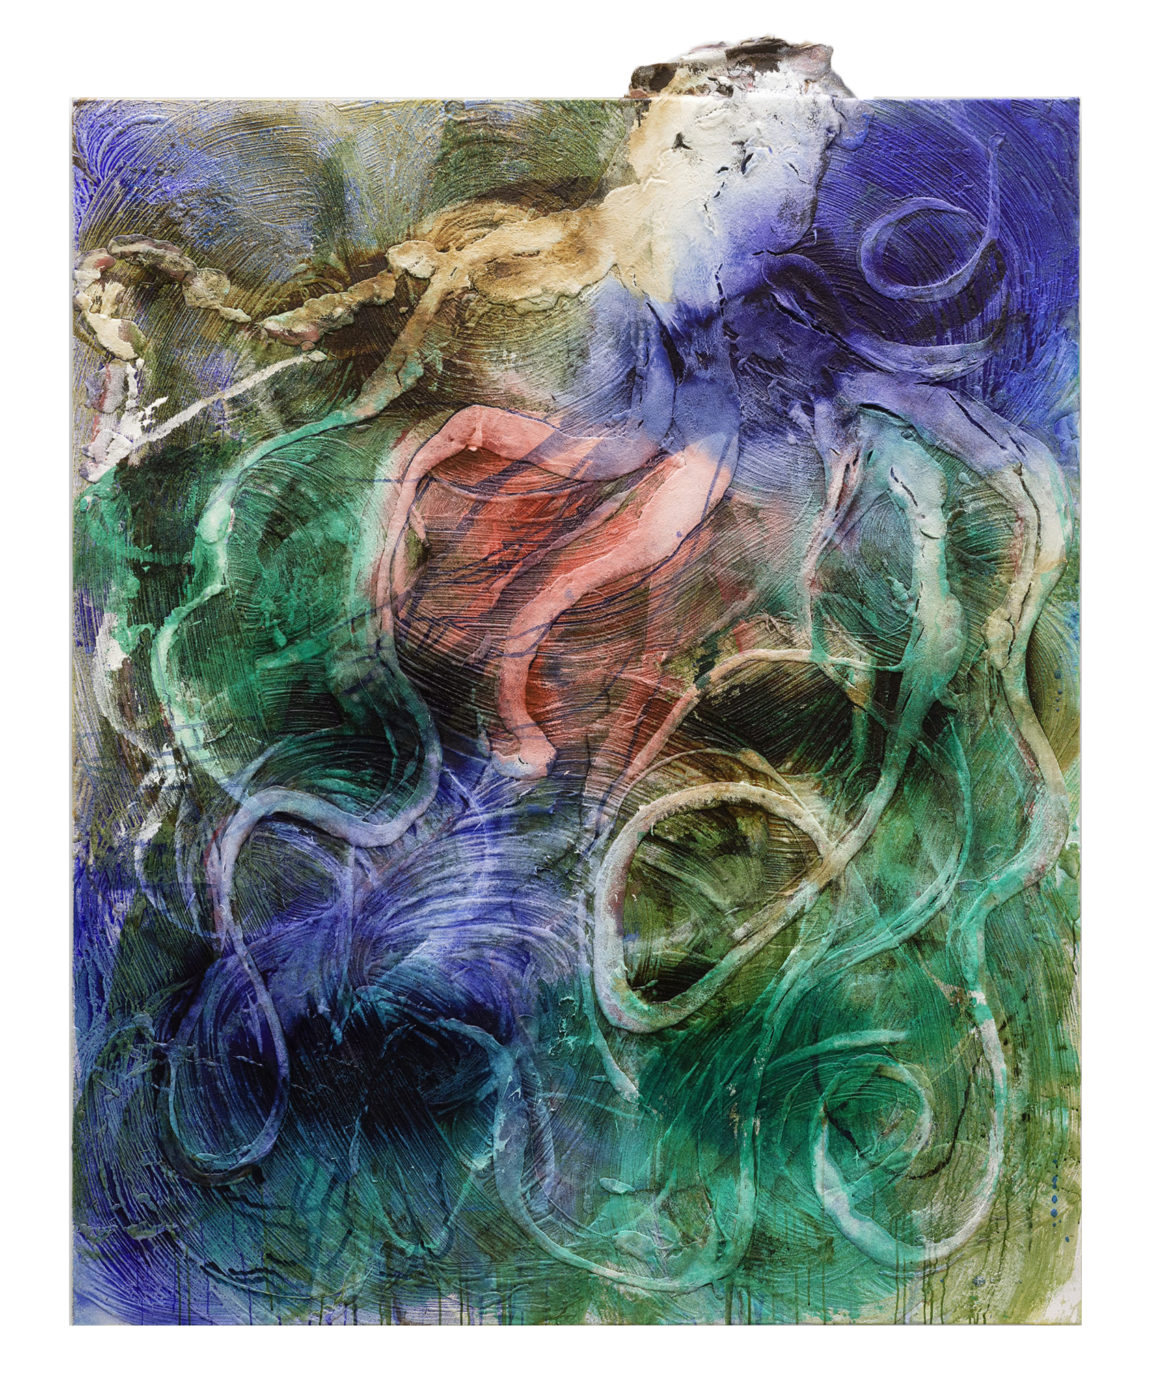 Pintura de Miquel Barceló del año 2019. Técnica mixta sobre lienzo. Medidas 259 x 205cm. Tiene una cabeza de pulpo que sobresale del lienzo